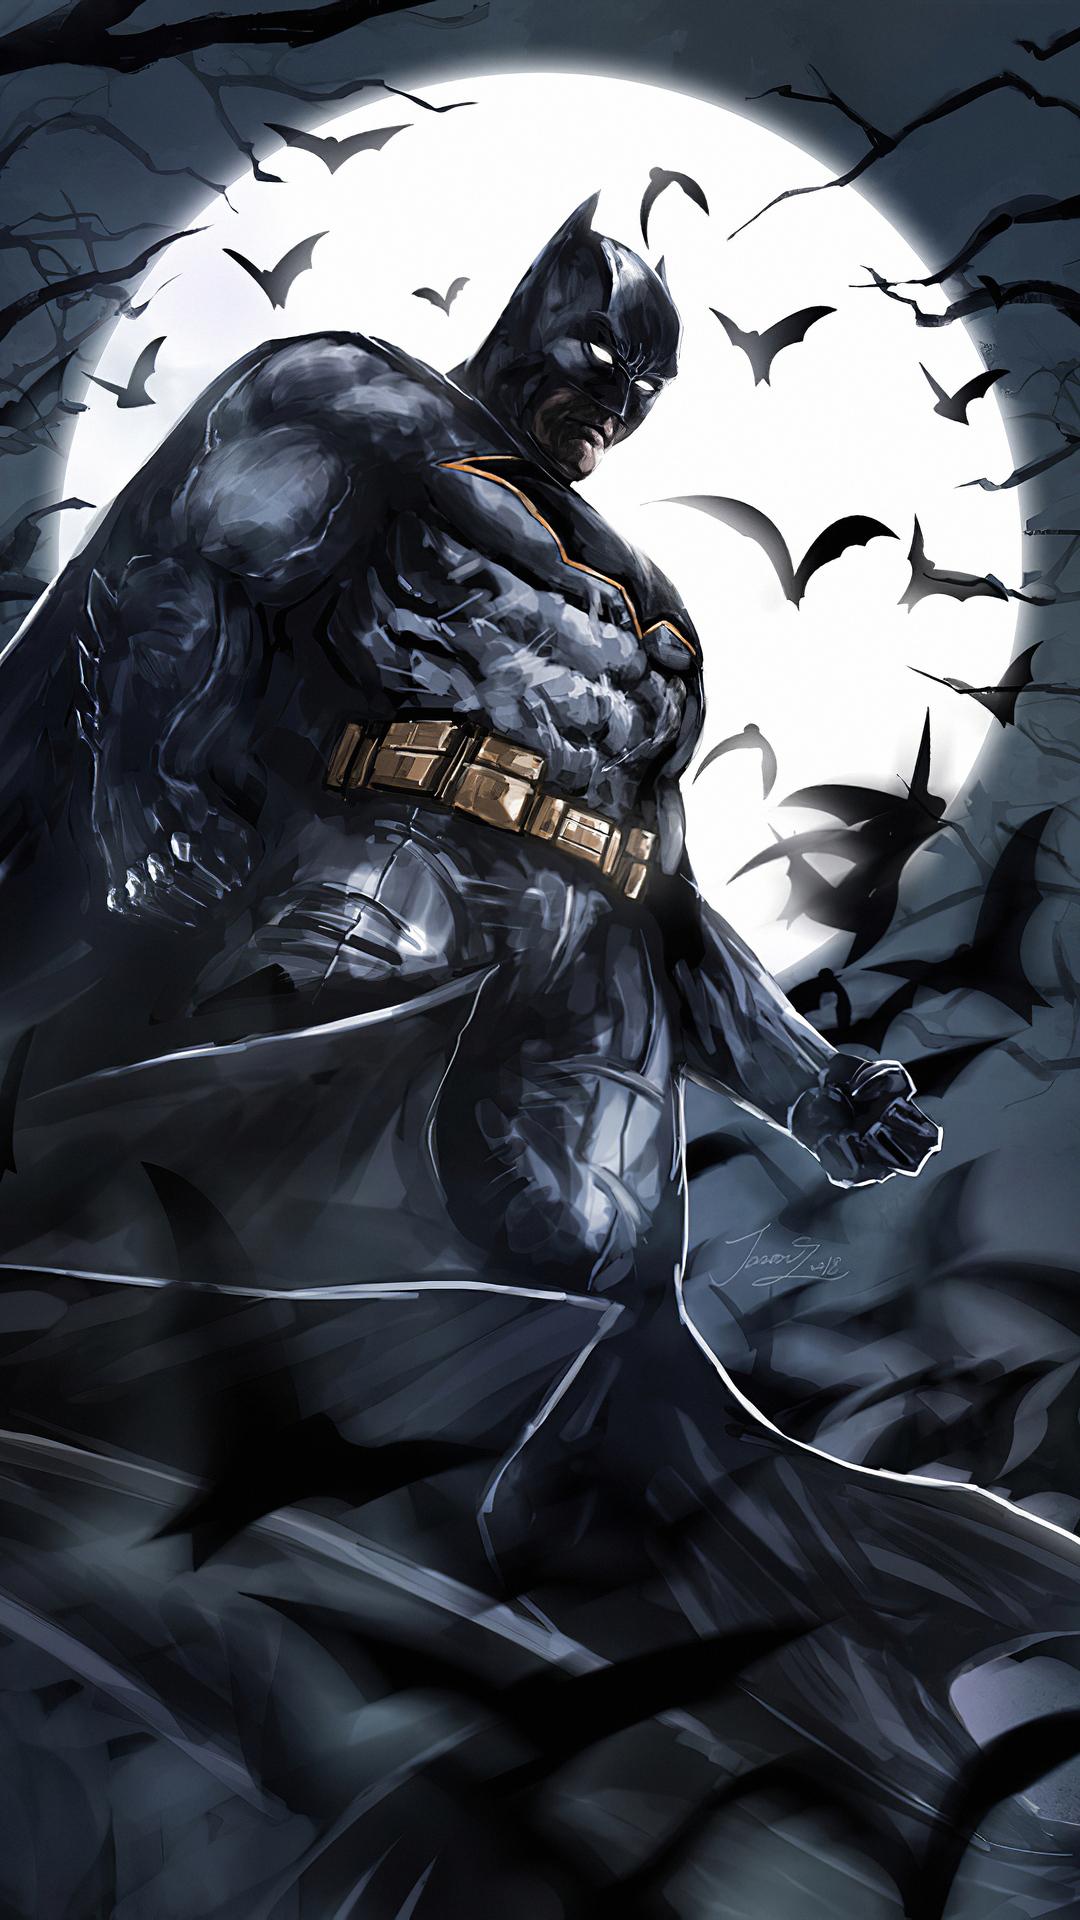 1080x1920 Batman Above 4k Iphone 7,6s,6 Plus, Pixel xl ...